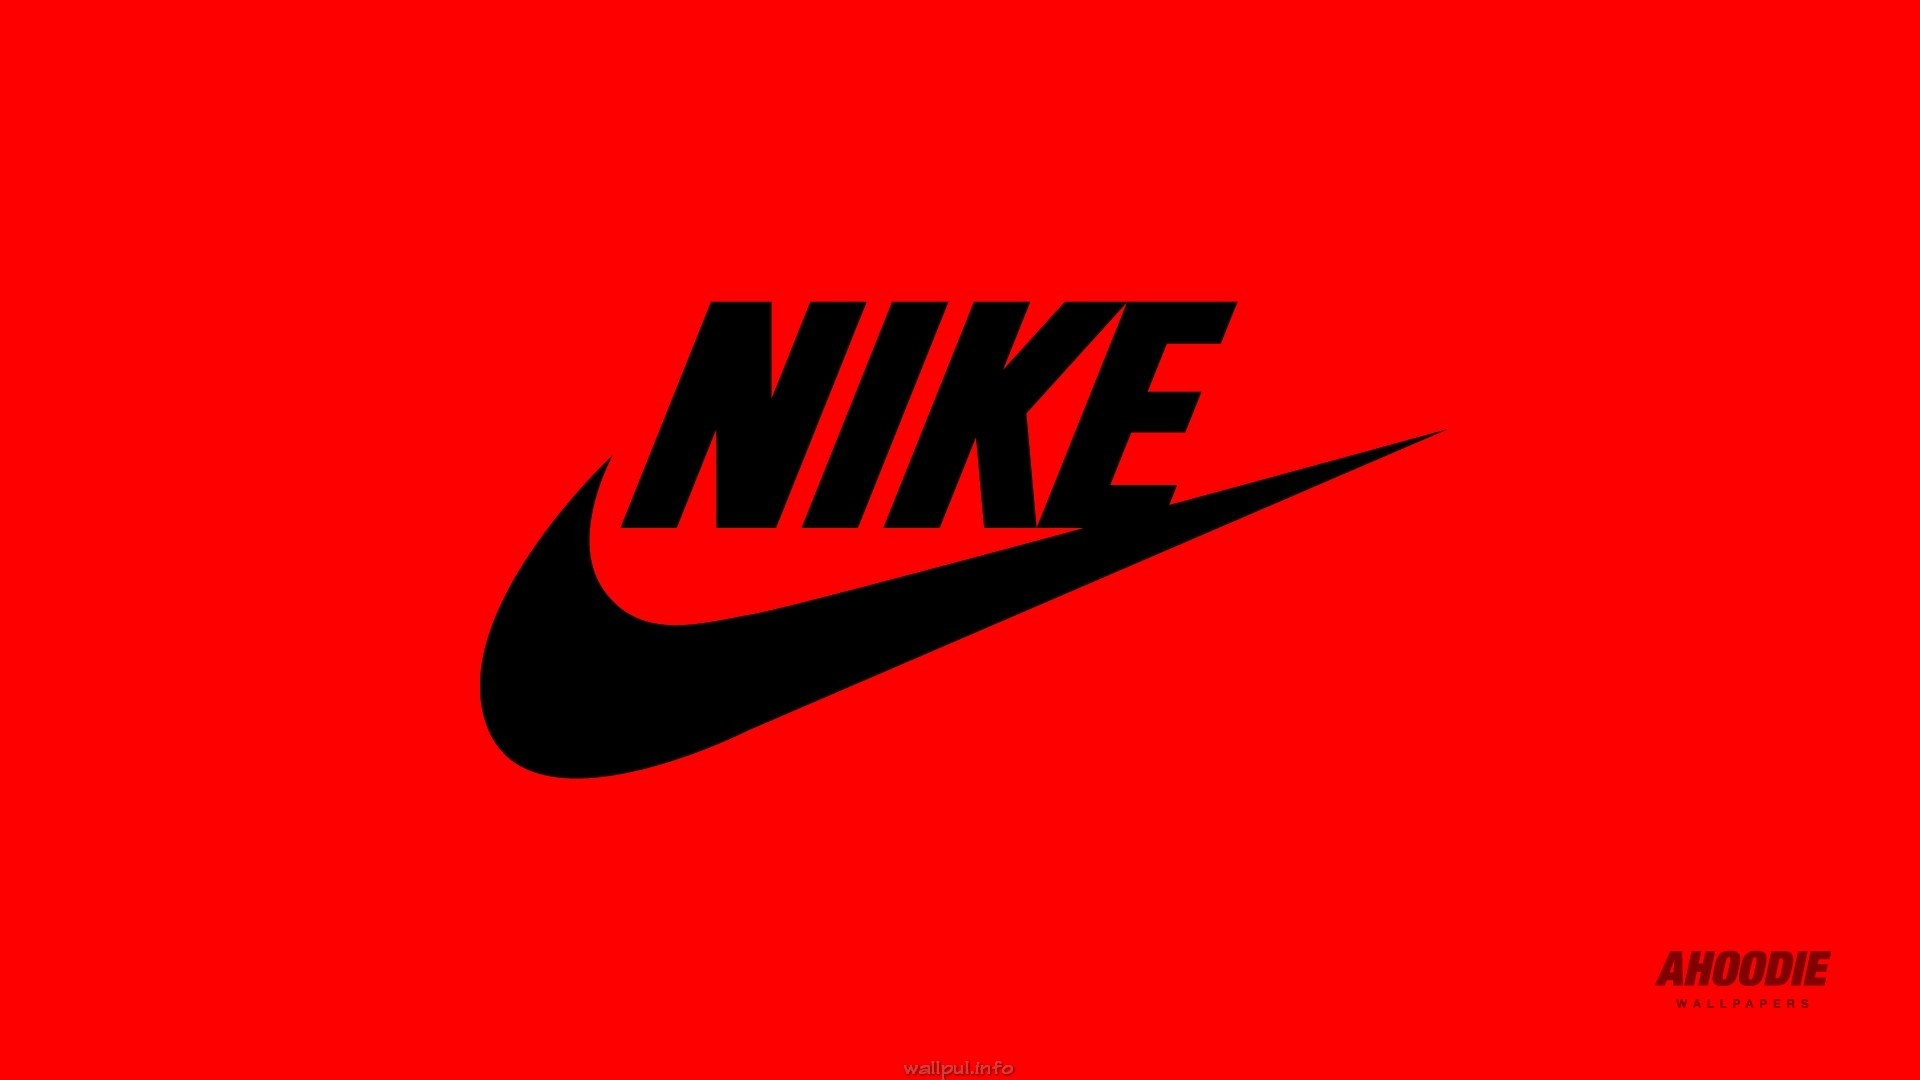 … Sports Nike Wallpaper Hd Widescreen 1080p …